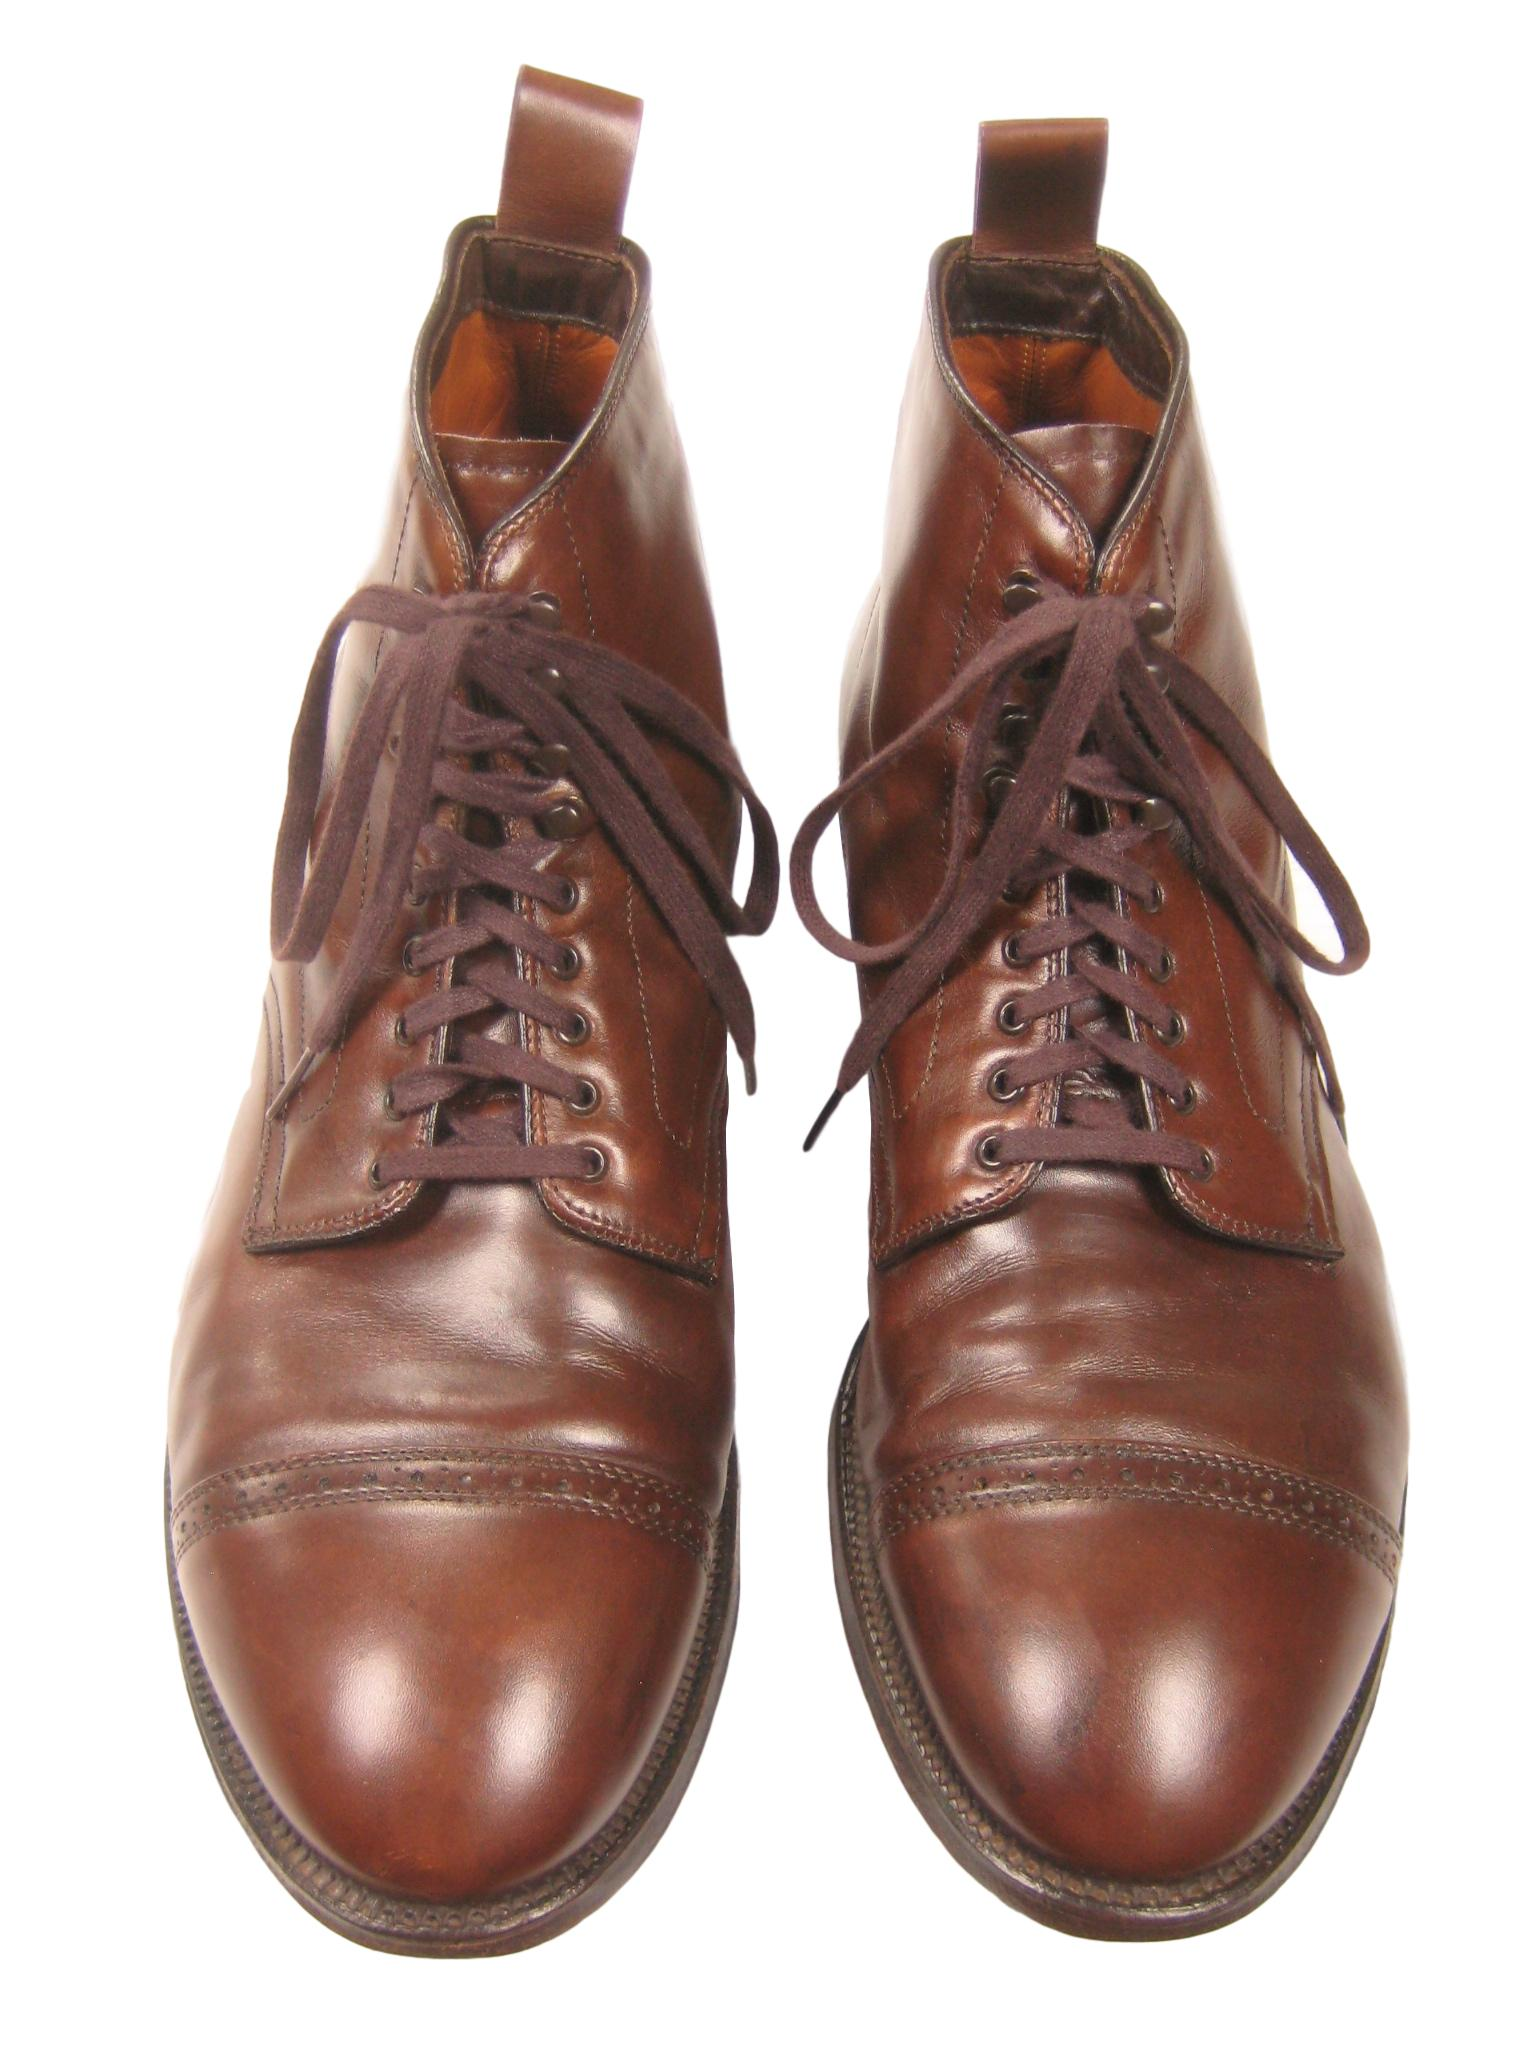 feab59459b Alden Alden X Conformal Shoe Store Nyc Cap-toe Brown Leather Ankle ...